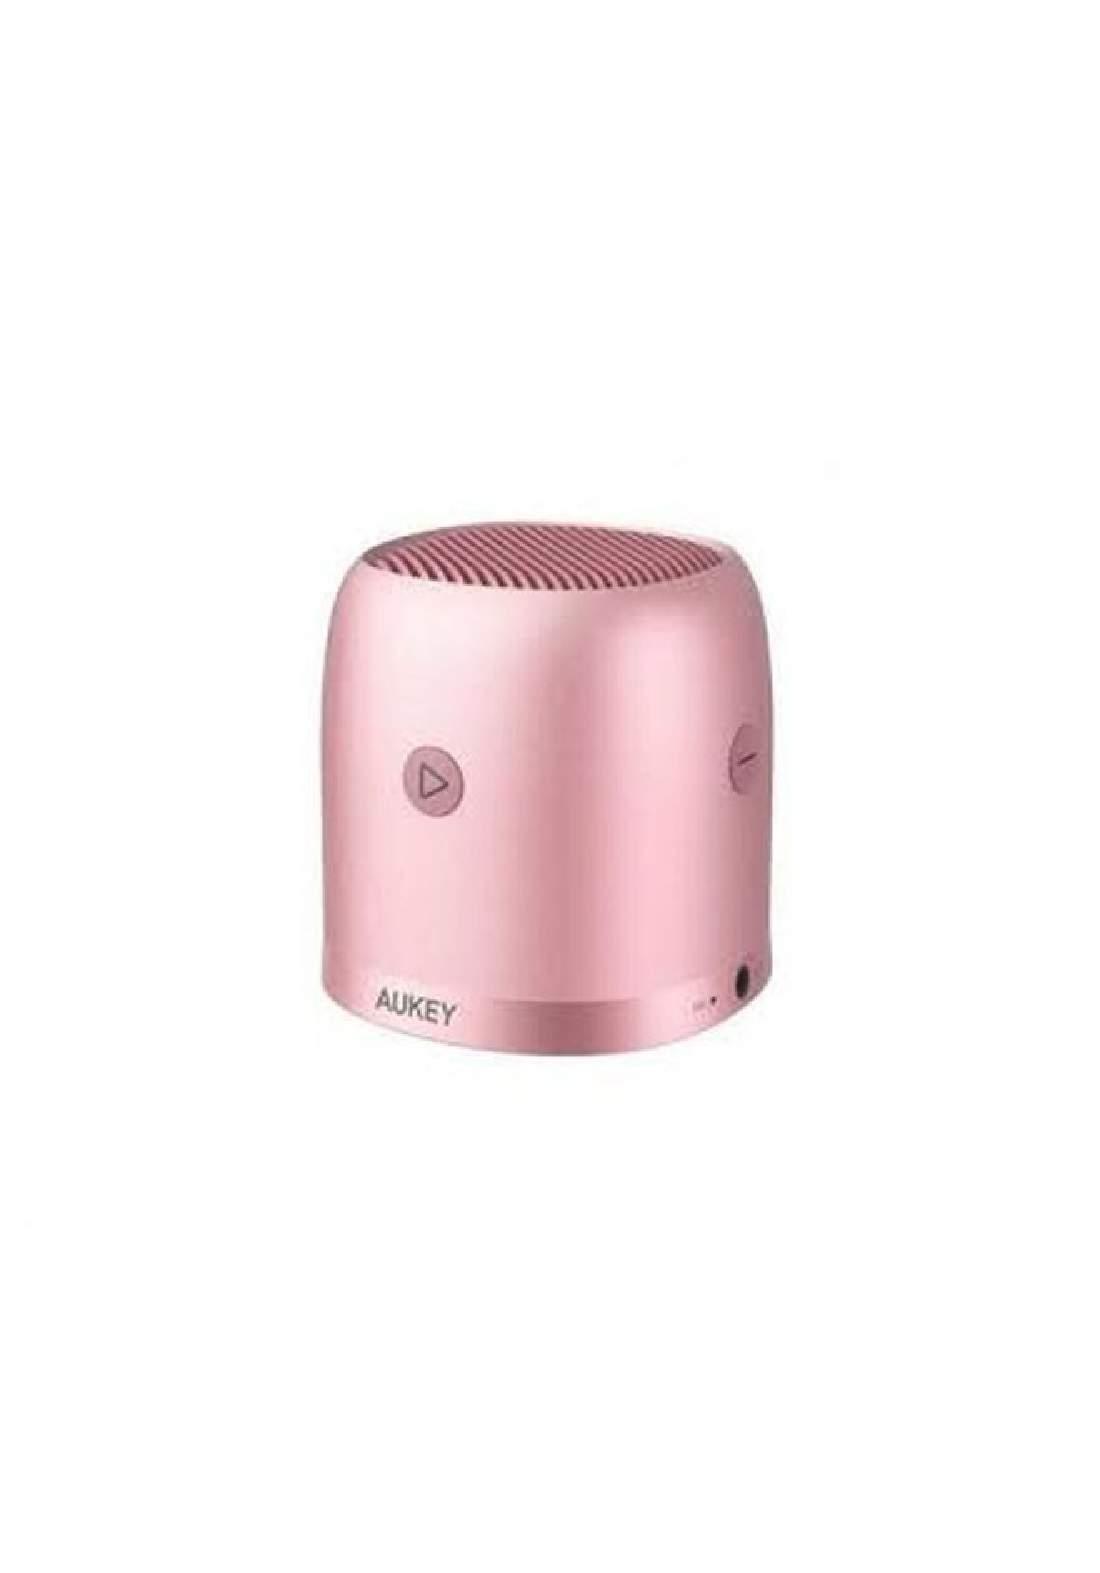 Aukey SK-M31 Wireless Mini Bluetooth Speaker with Enhanced Bass-Pink (1495) سبيكر